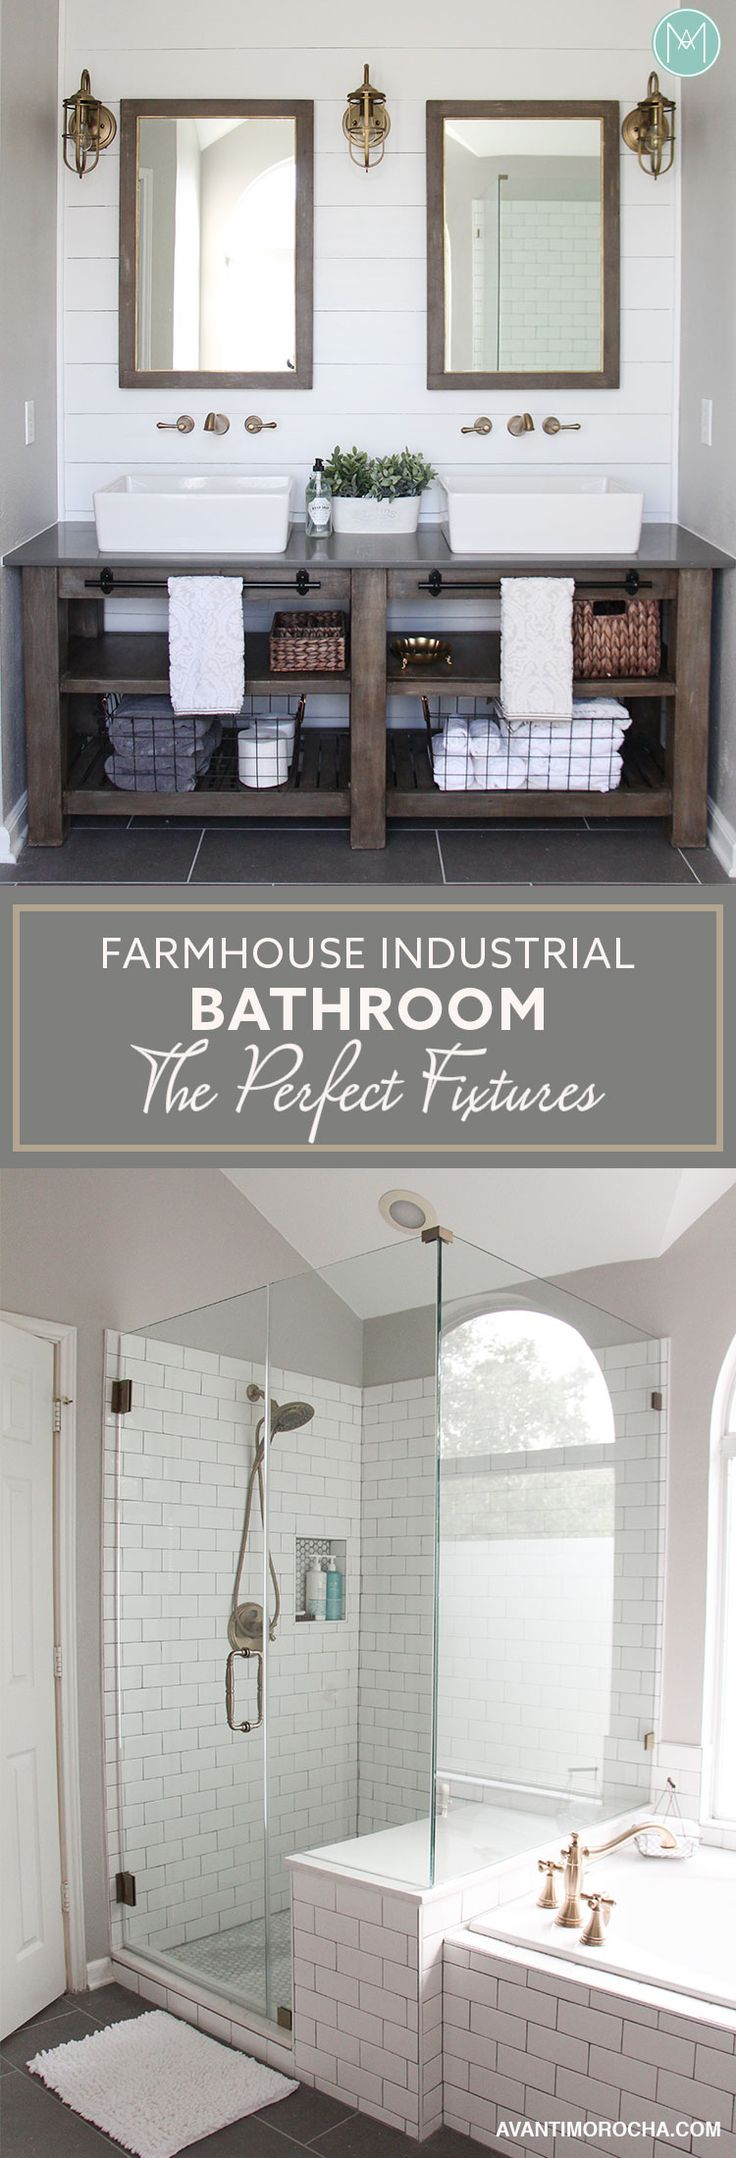 Industrial Farmhouse Bathroom – The Perfect Fixtures -